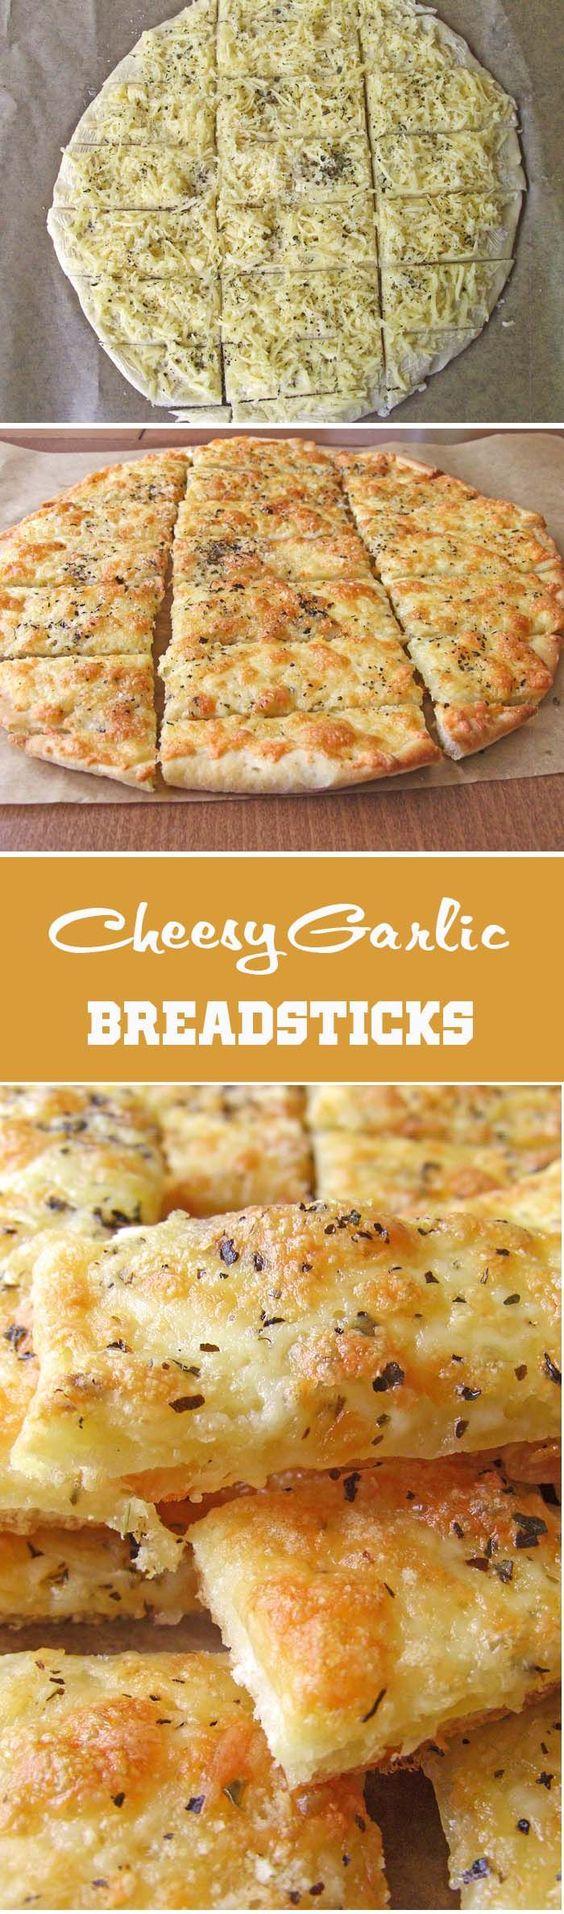 http://sugarapron.com/2014/08/03/easy-cheesy-garlic-breadsticks/